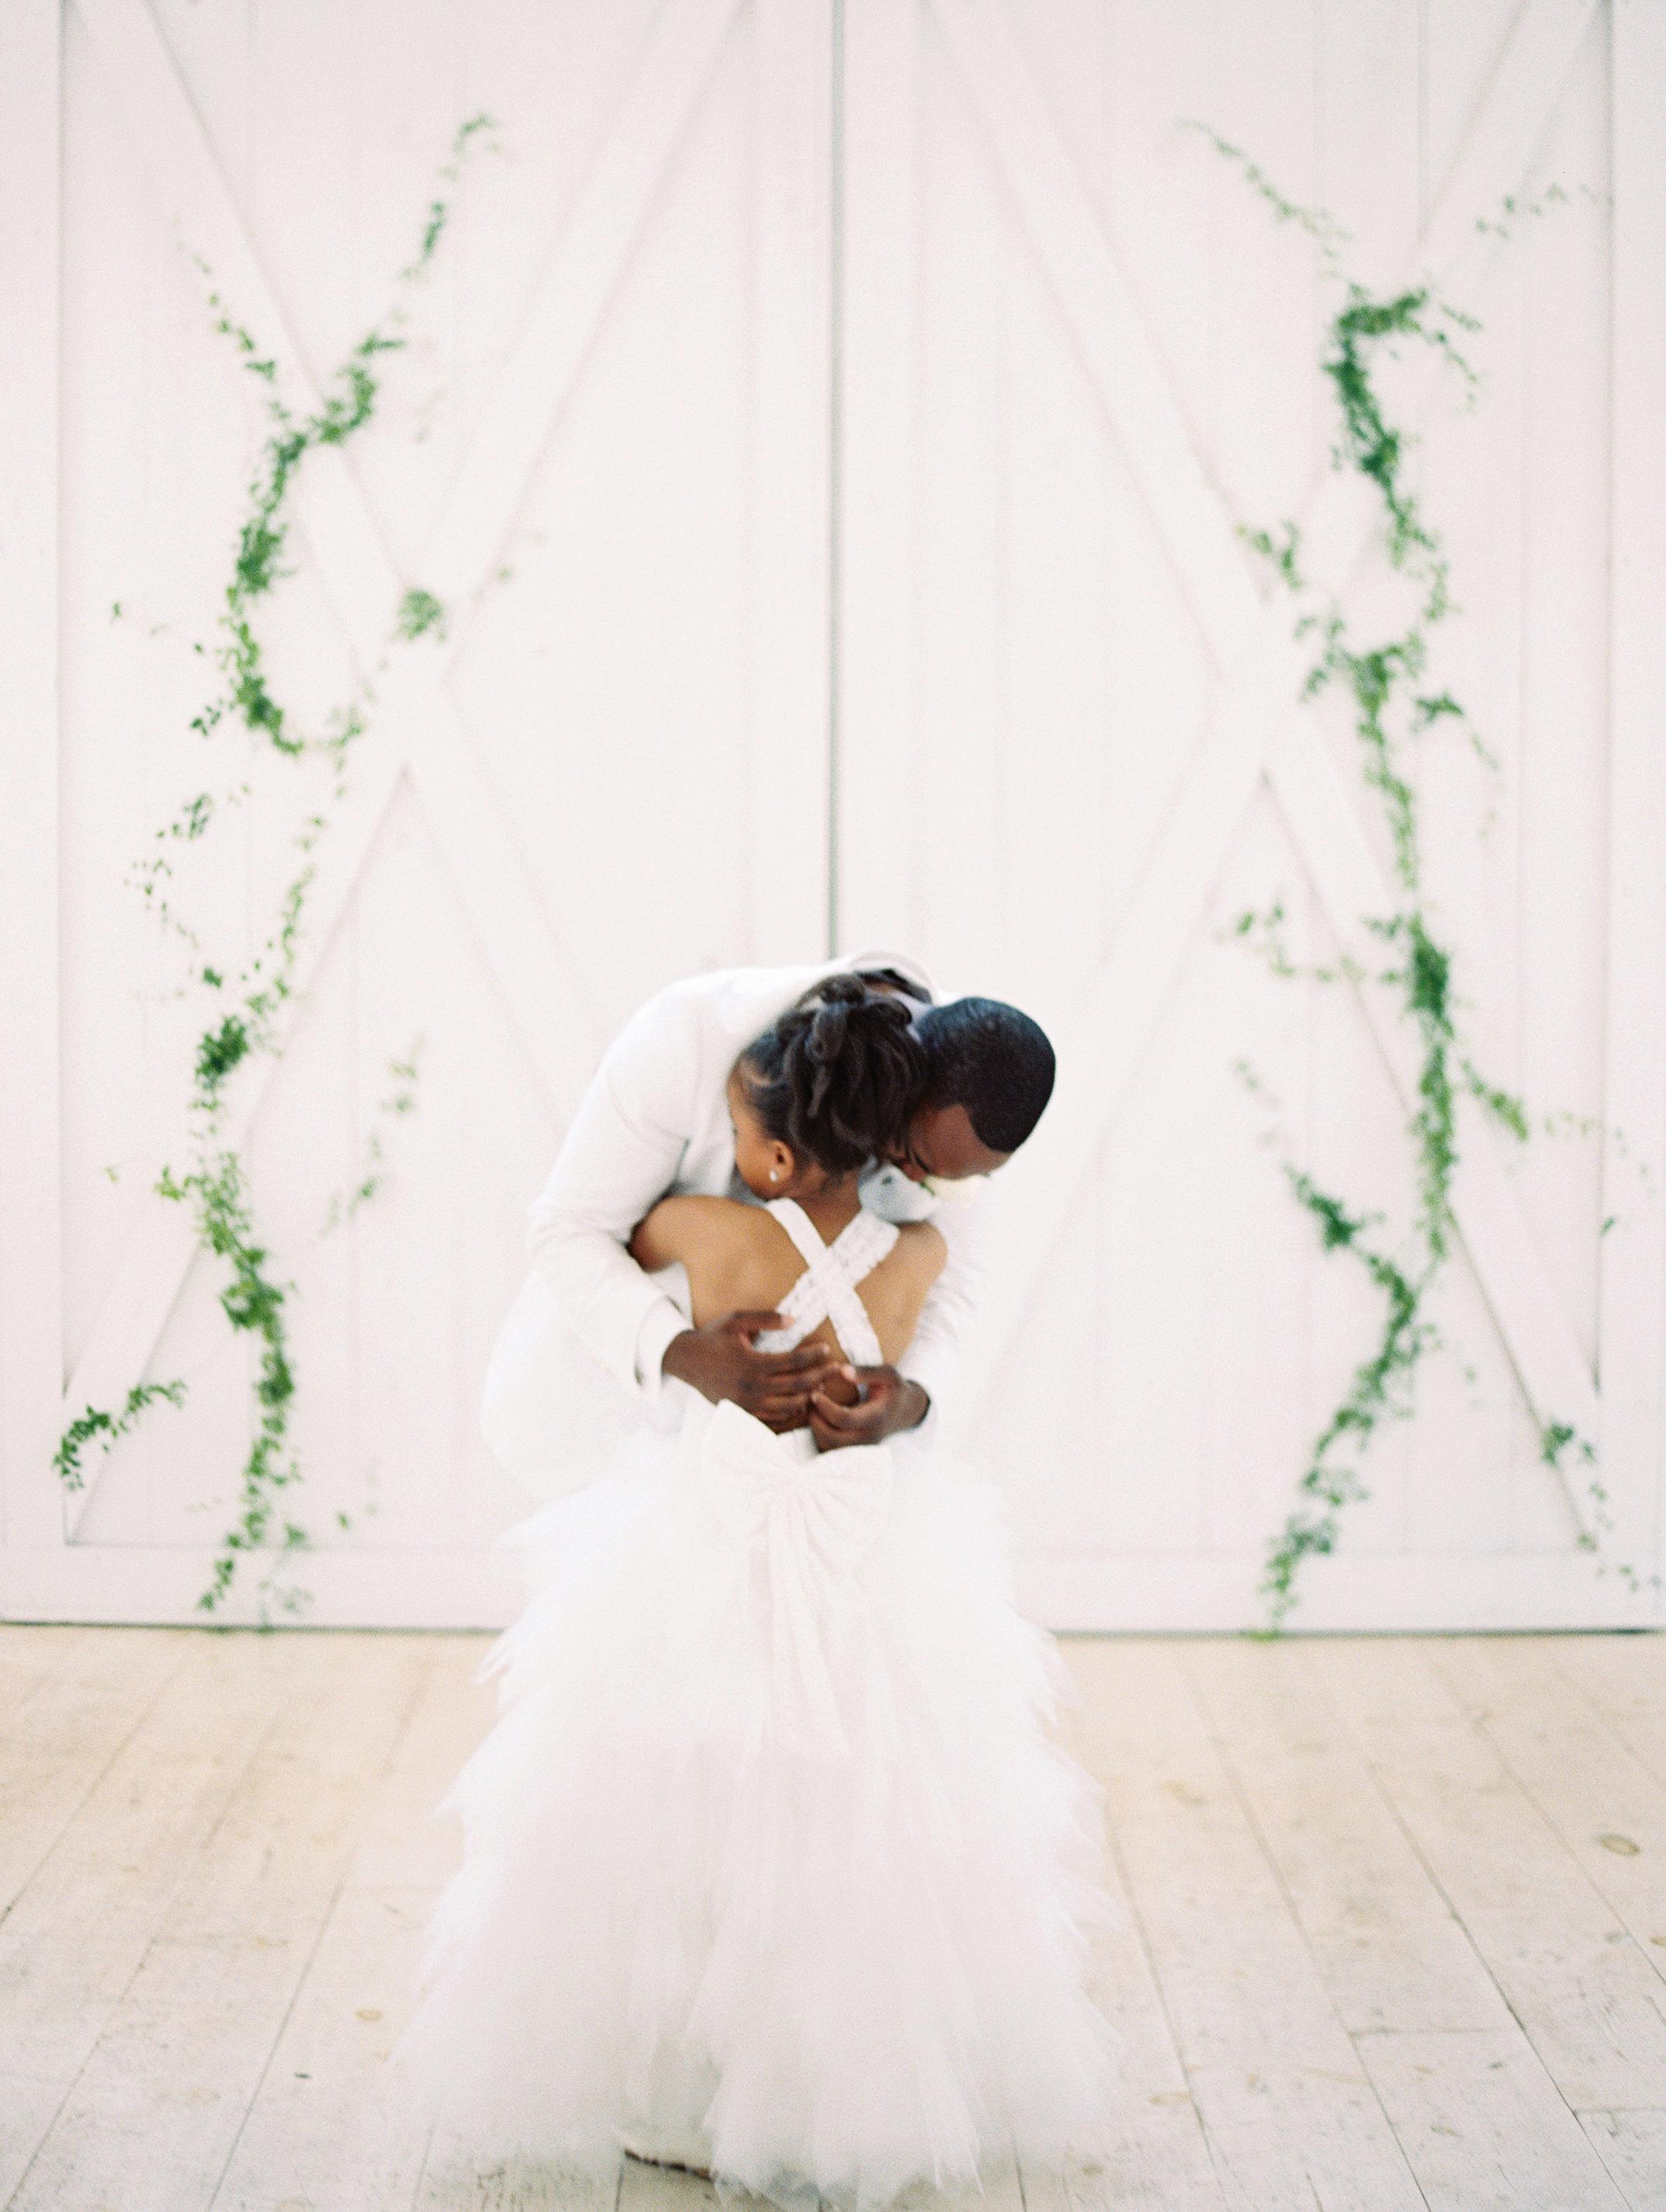 shakira travis wedding junior bridesmaid hugging groom